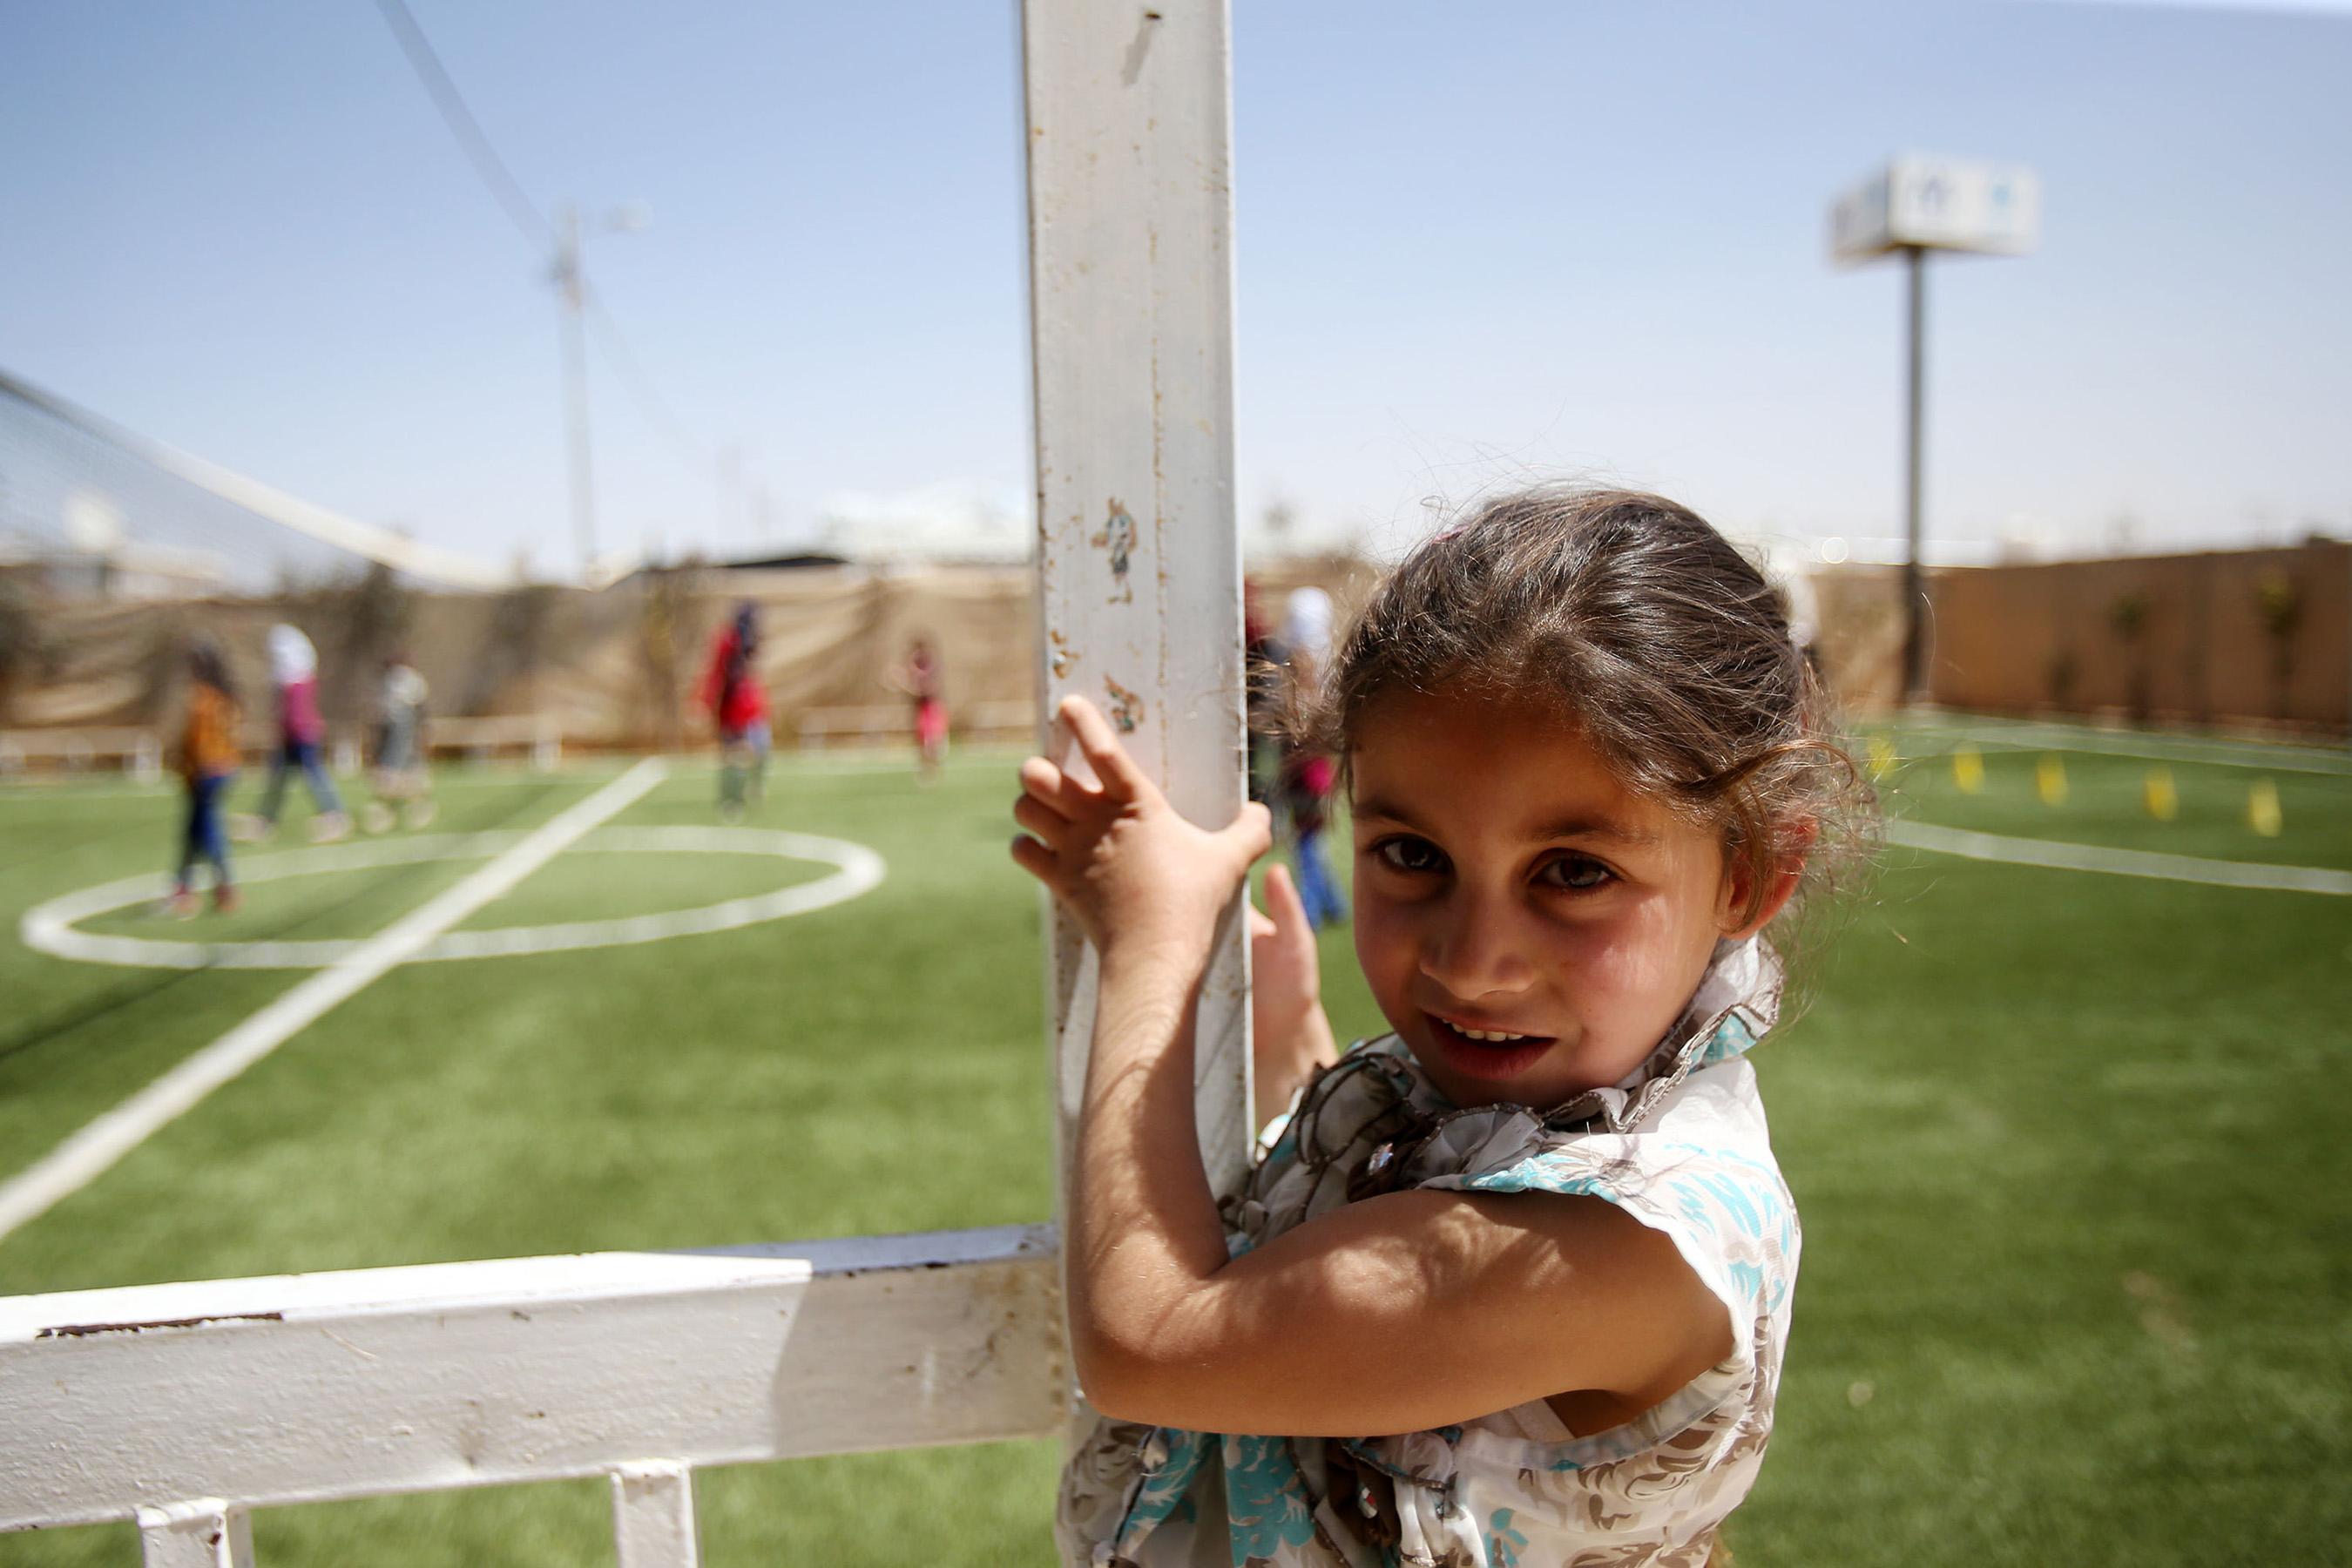 Children participate in recreational activities in UNCIEF Child Friendly Spaces | Credit: ©SalahMalkawi